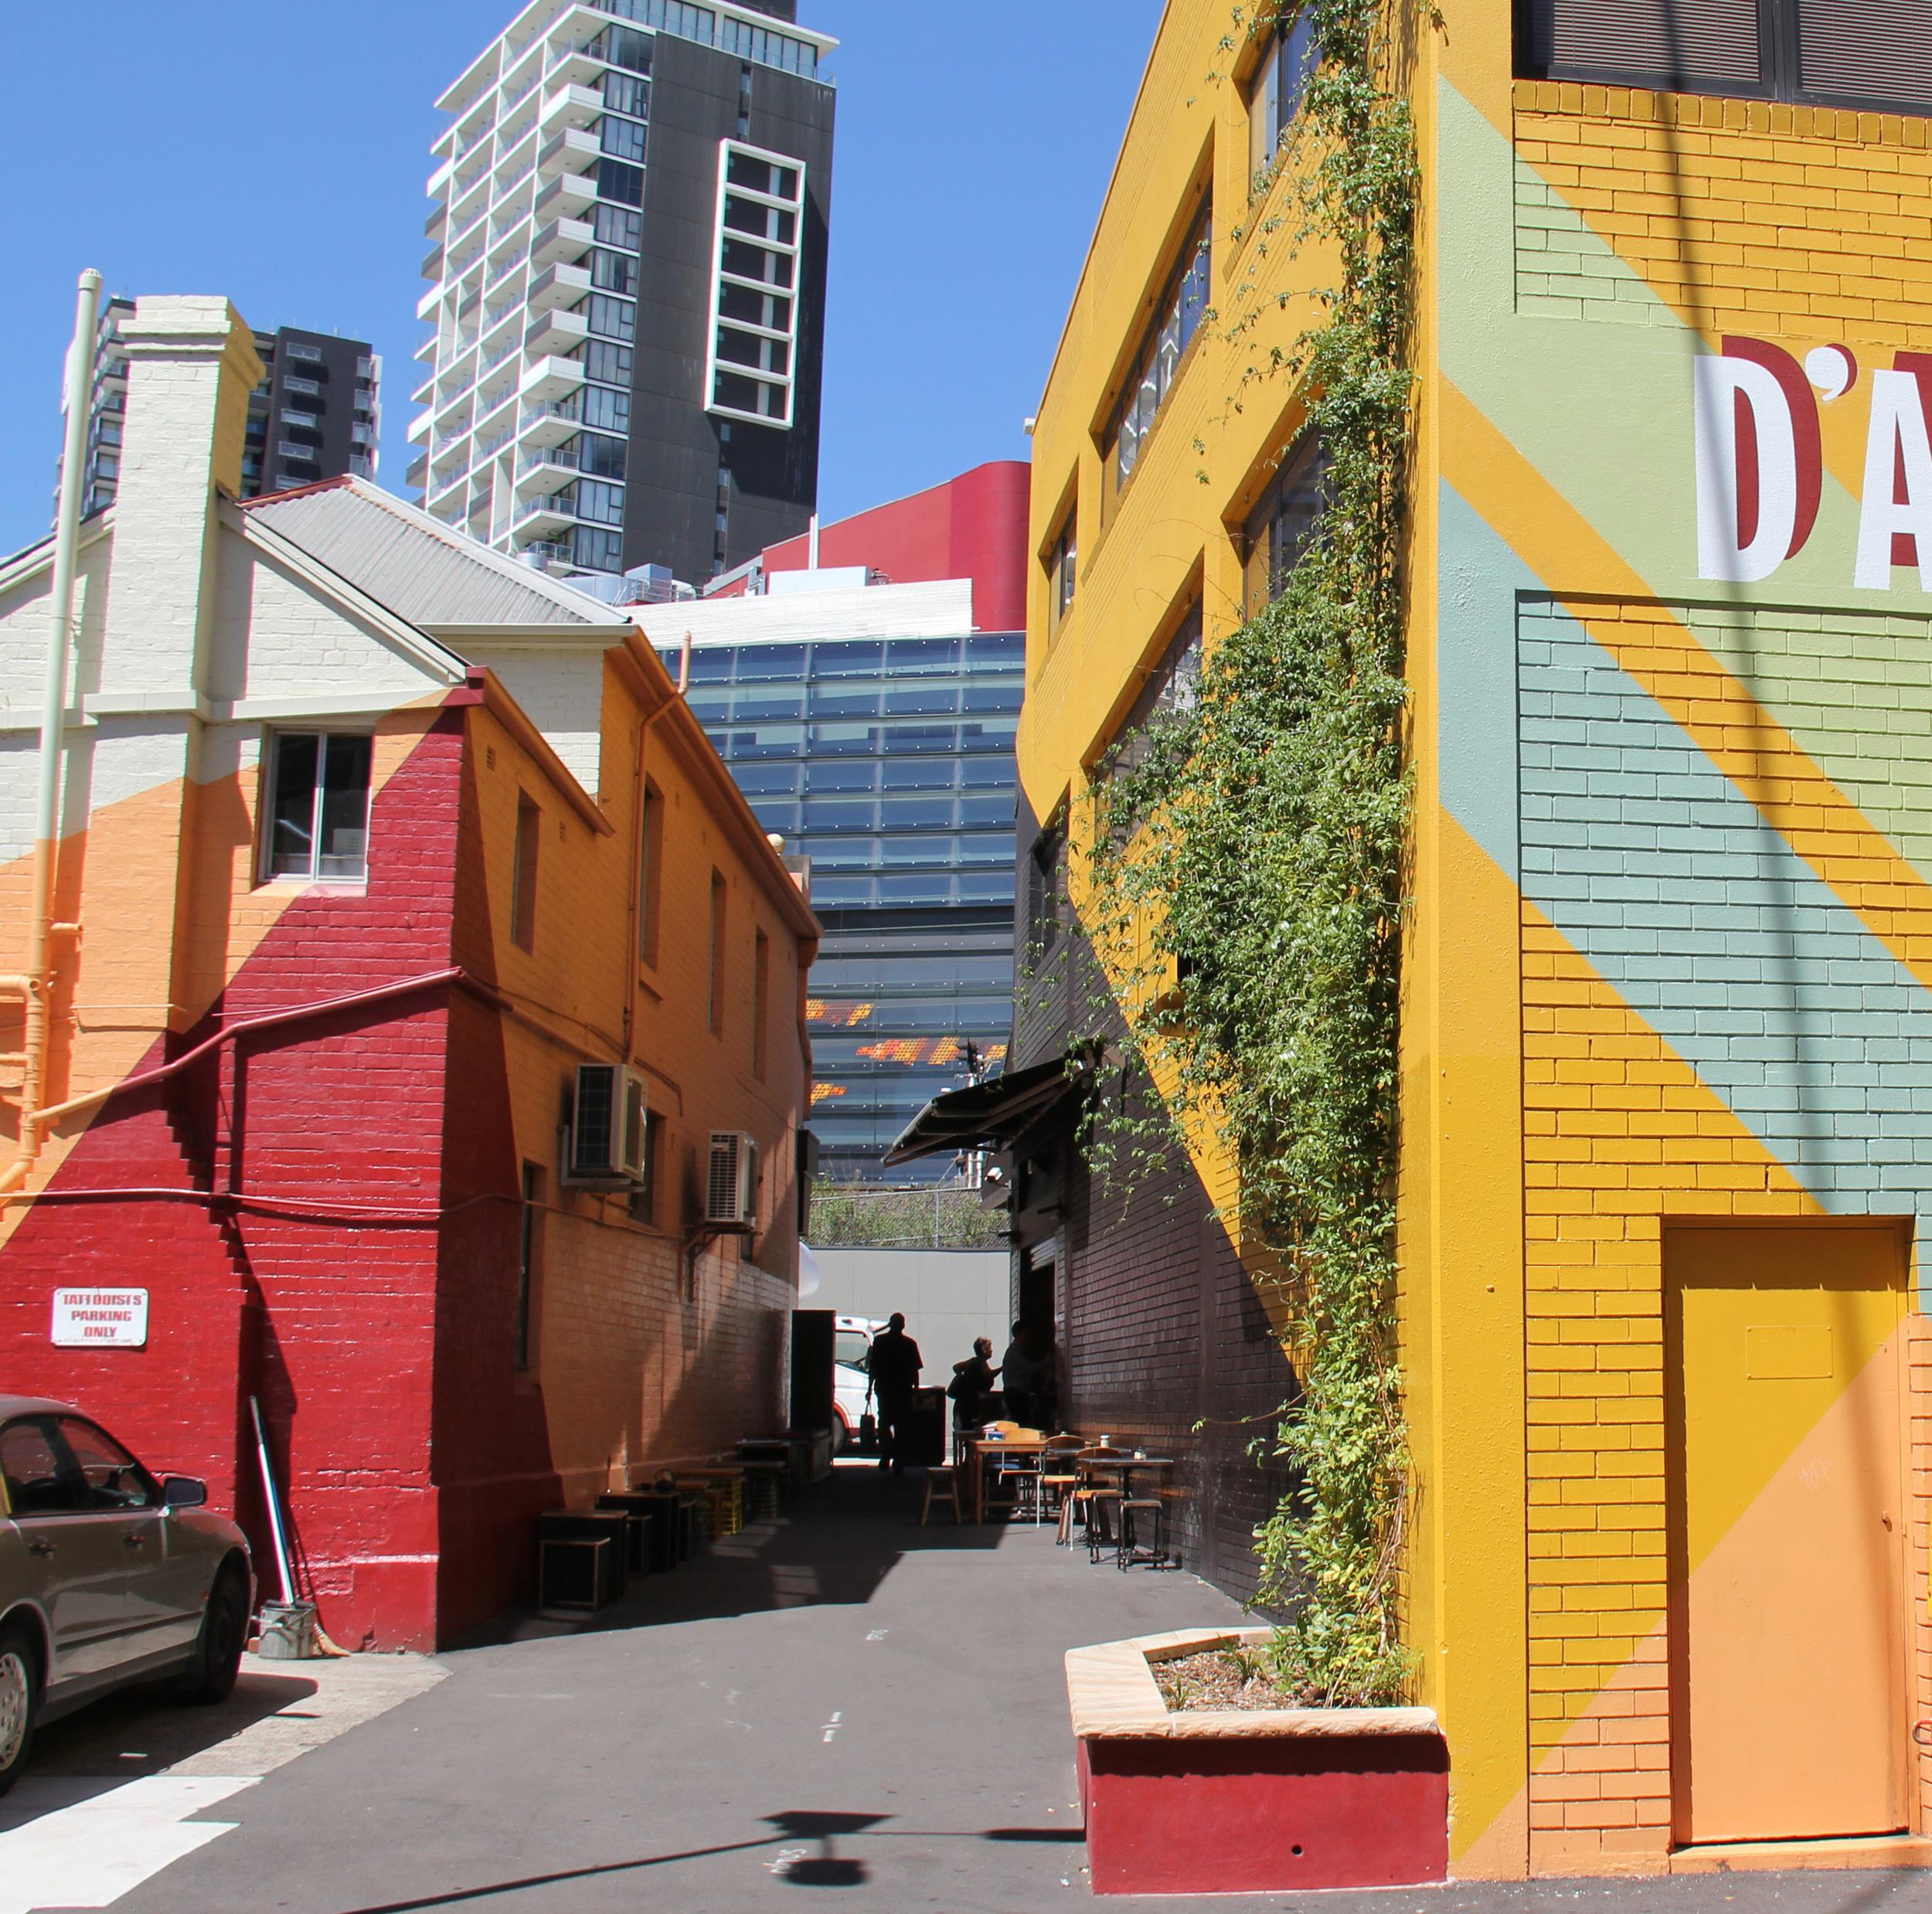 DARCY STREET &LANEWAY | Parramatta, Sydney